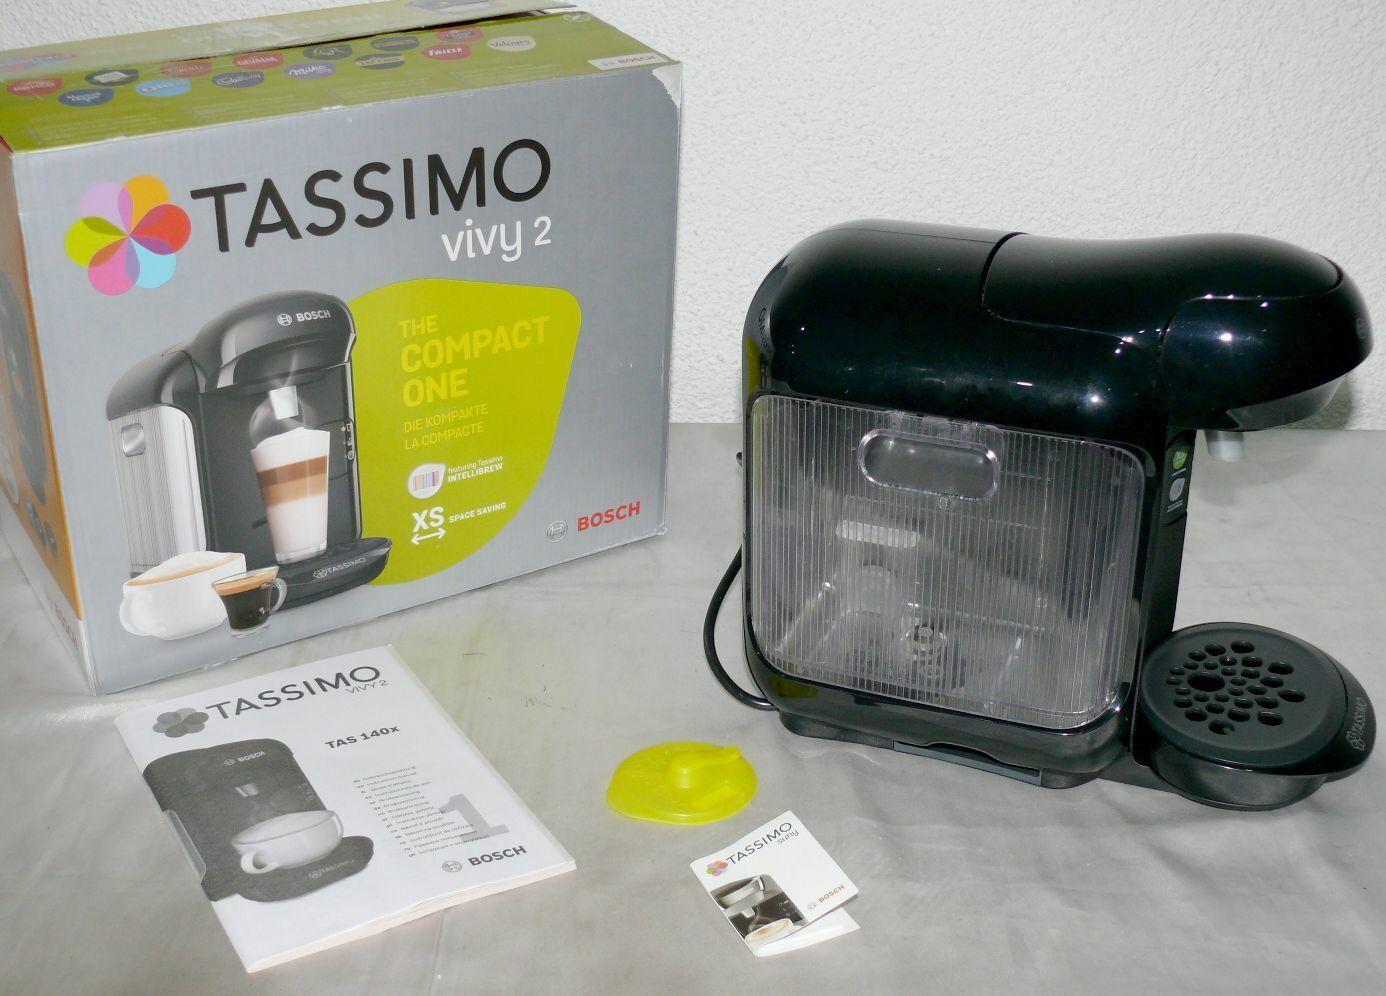 Bosch TAS1402 Vivy2 XS Slim Tassimo Kapsel Kaffeemaschine 1300W 0,7L Black